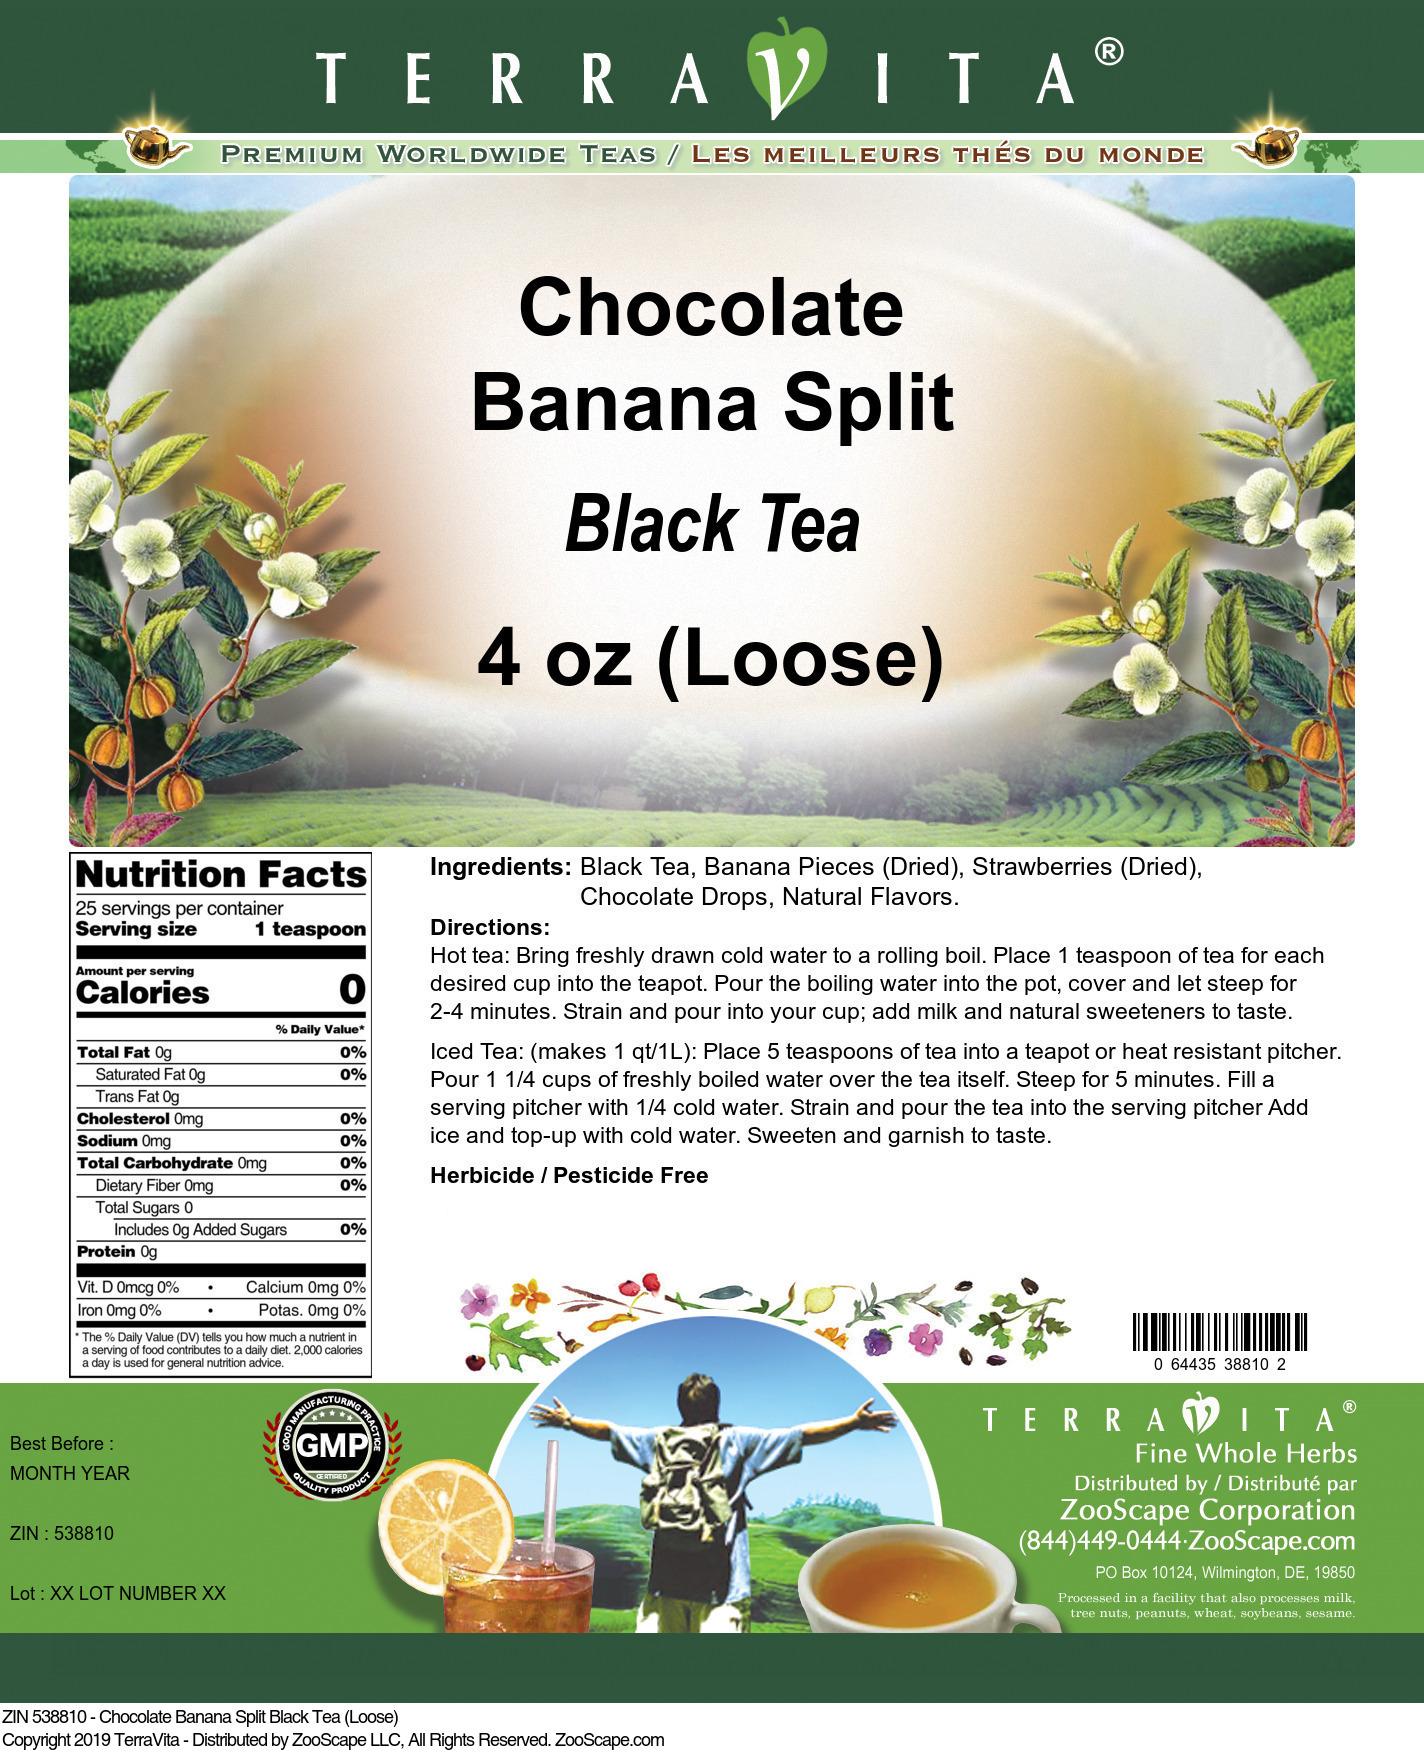 Chocolate Banana Split Black Tea